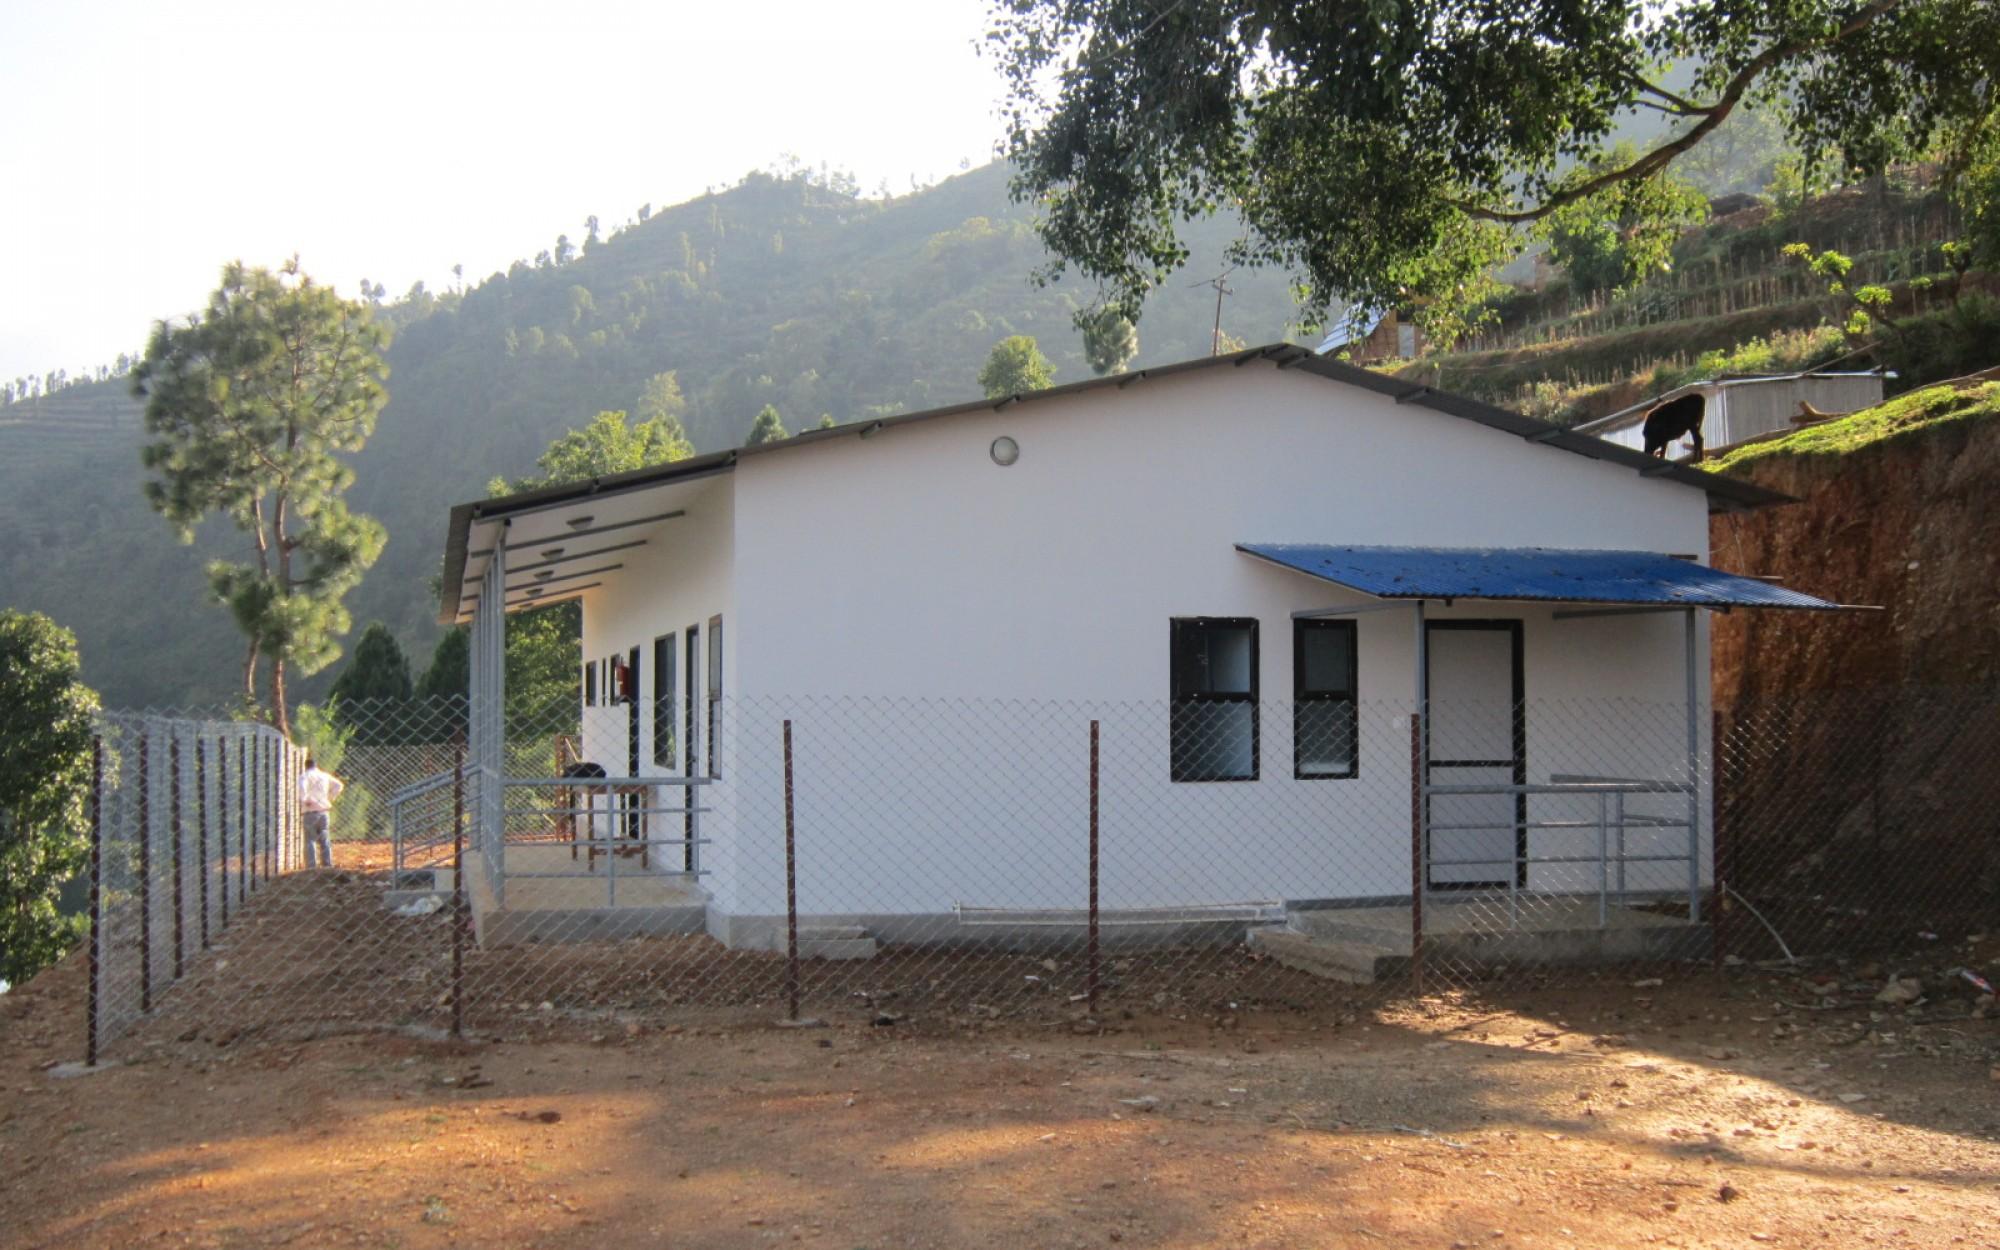 Prefab building in Dolalghat Health Post, Sindhupalchowk, Nepal